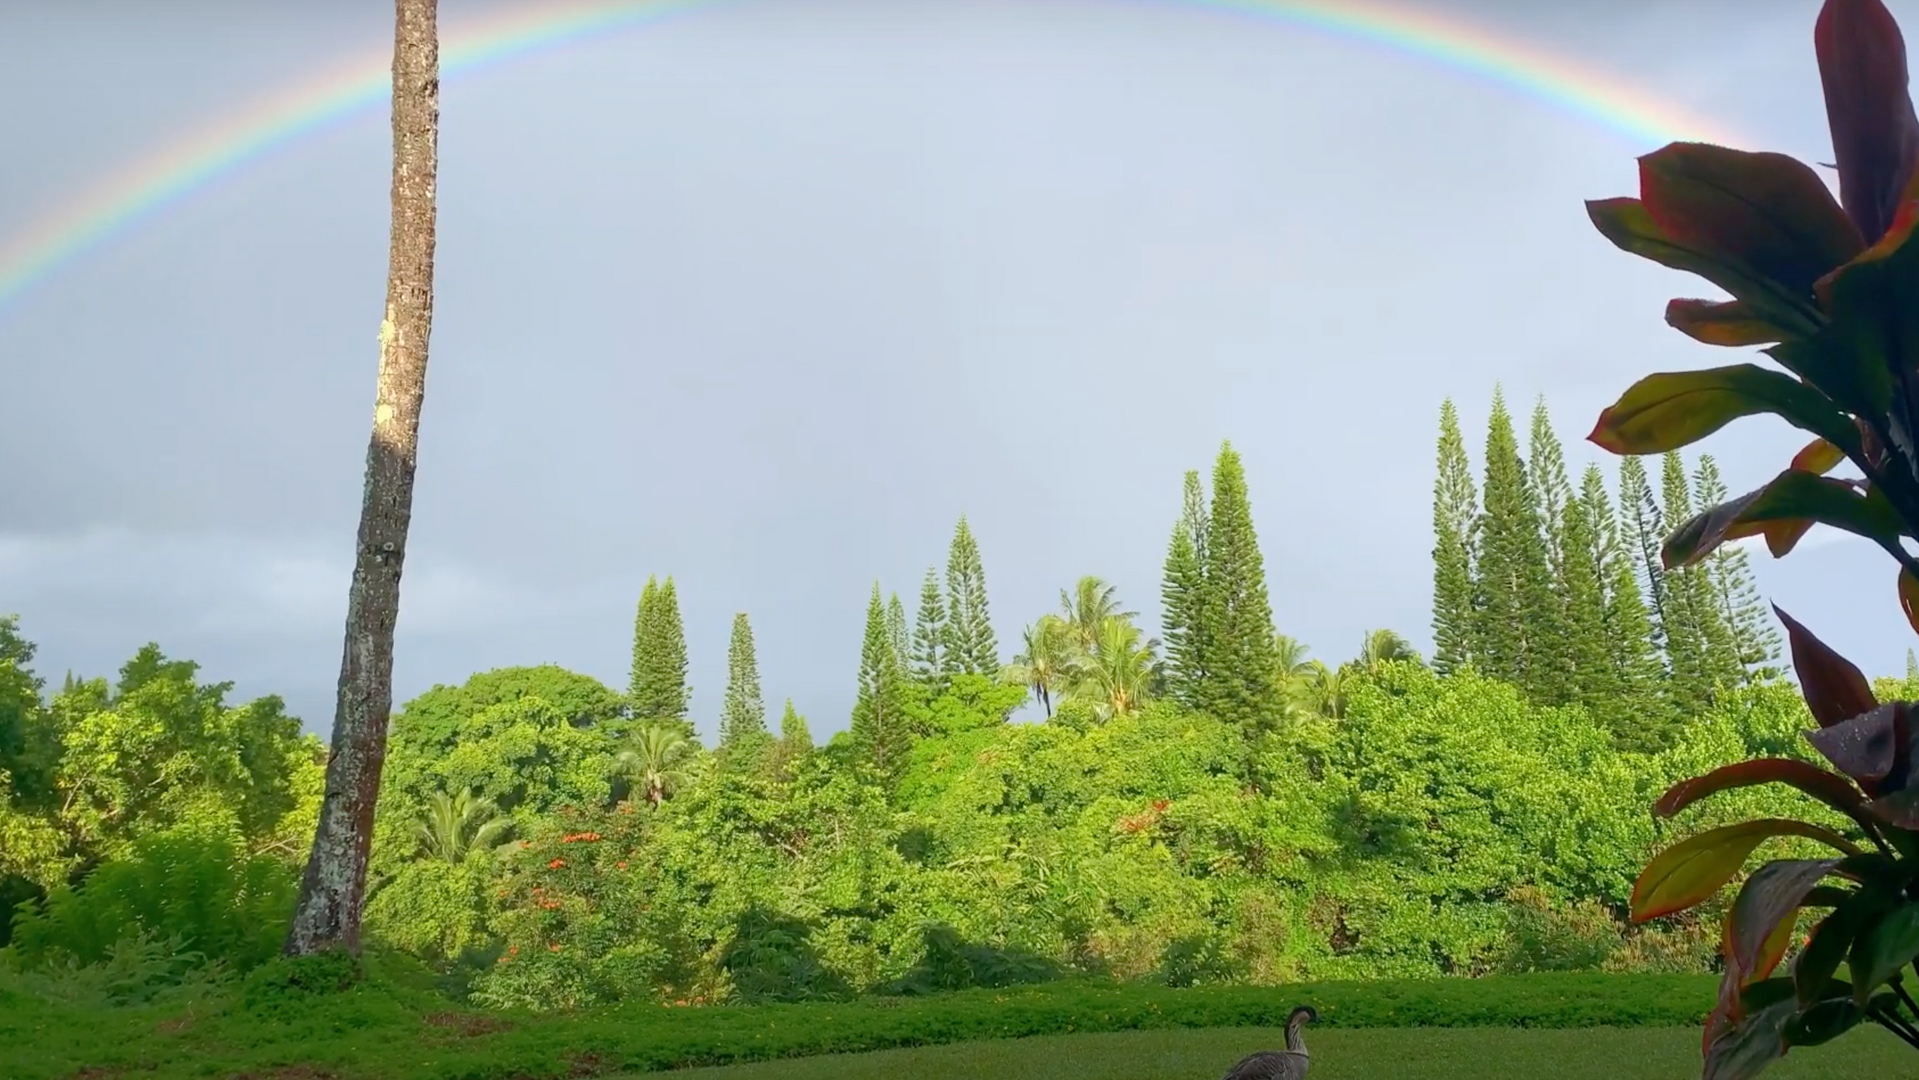 Spirit of Aloha 07 - Double Rainbow & Nene